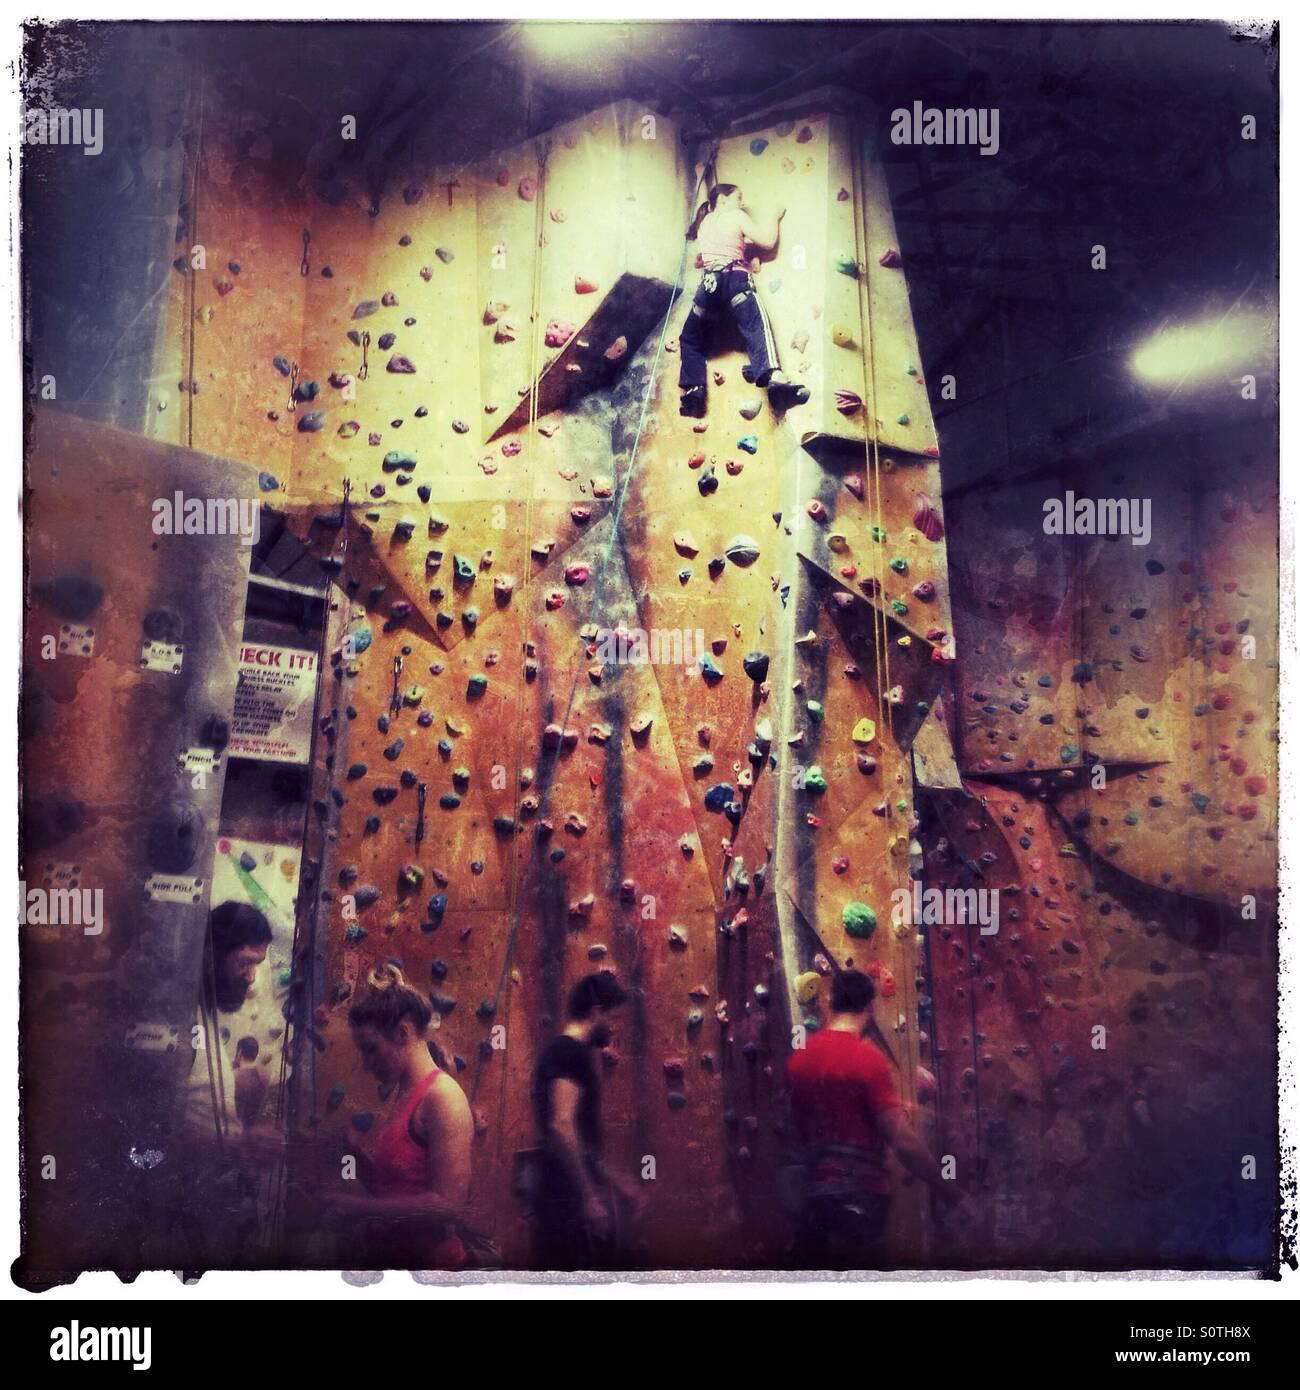 Pulling on plastic - Indoor rock climbing - Stock Image